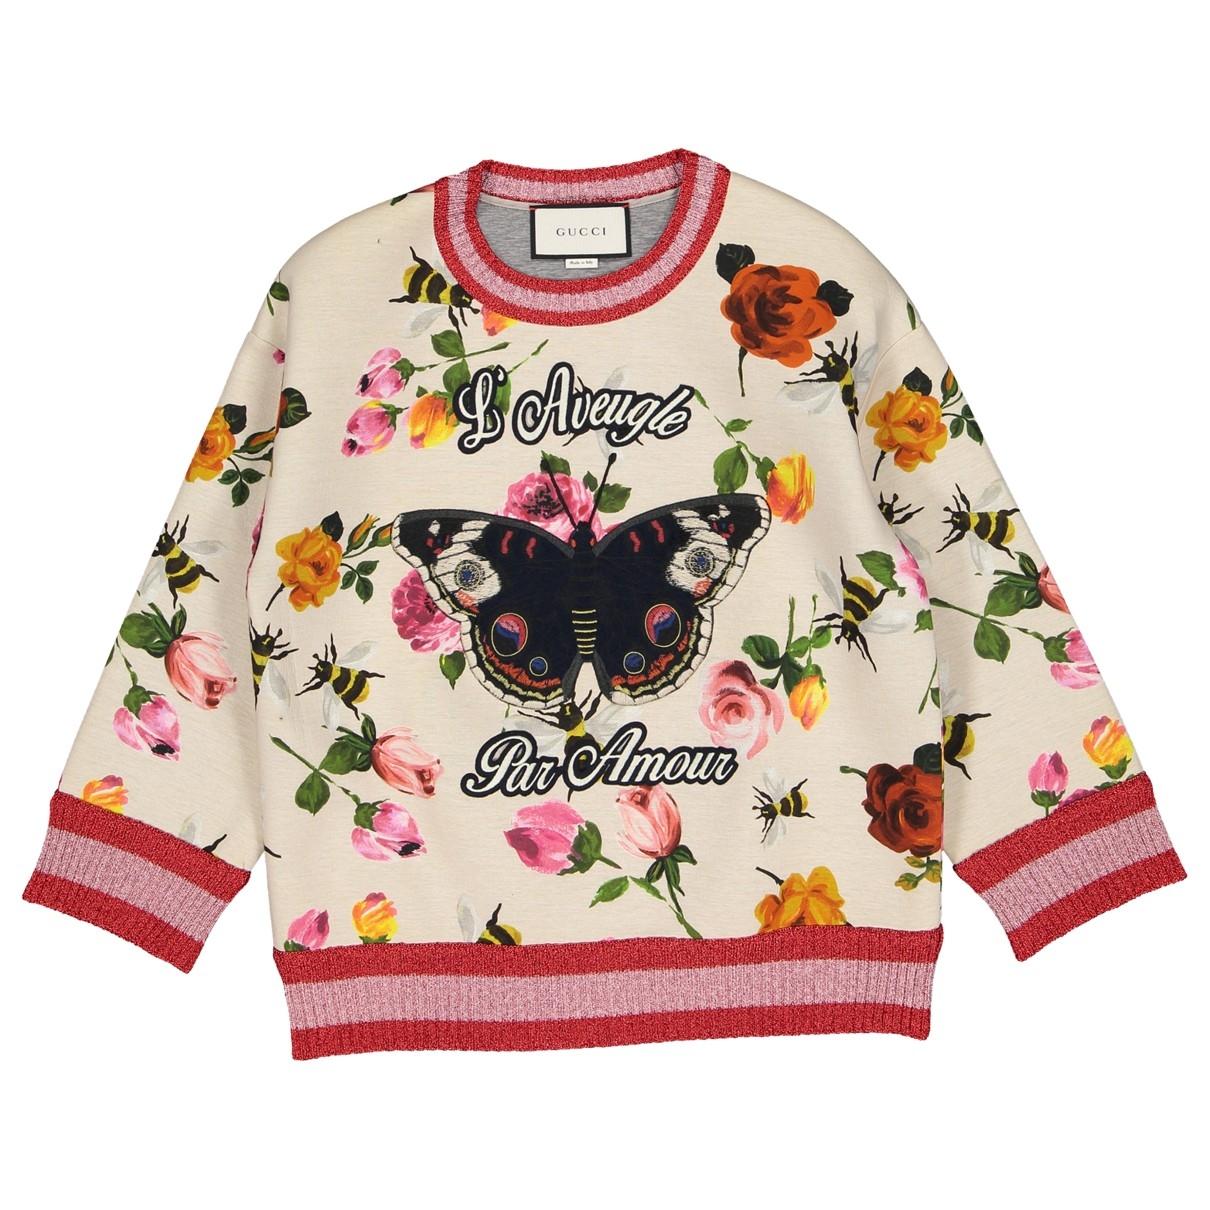 Gucci \N Pullover in  Bunt Baumwolle